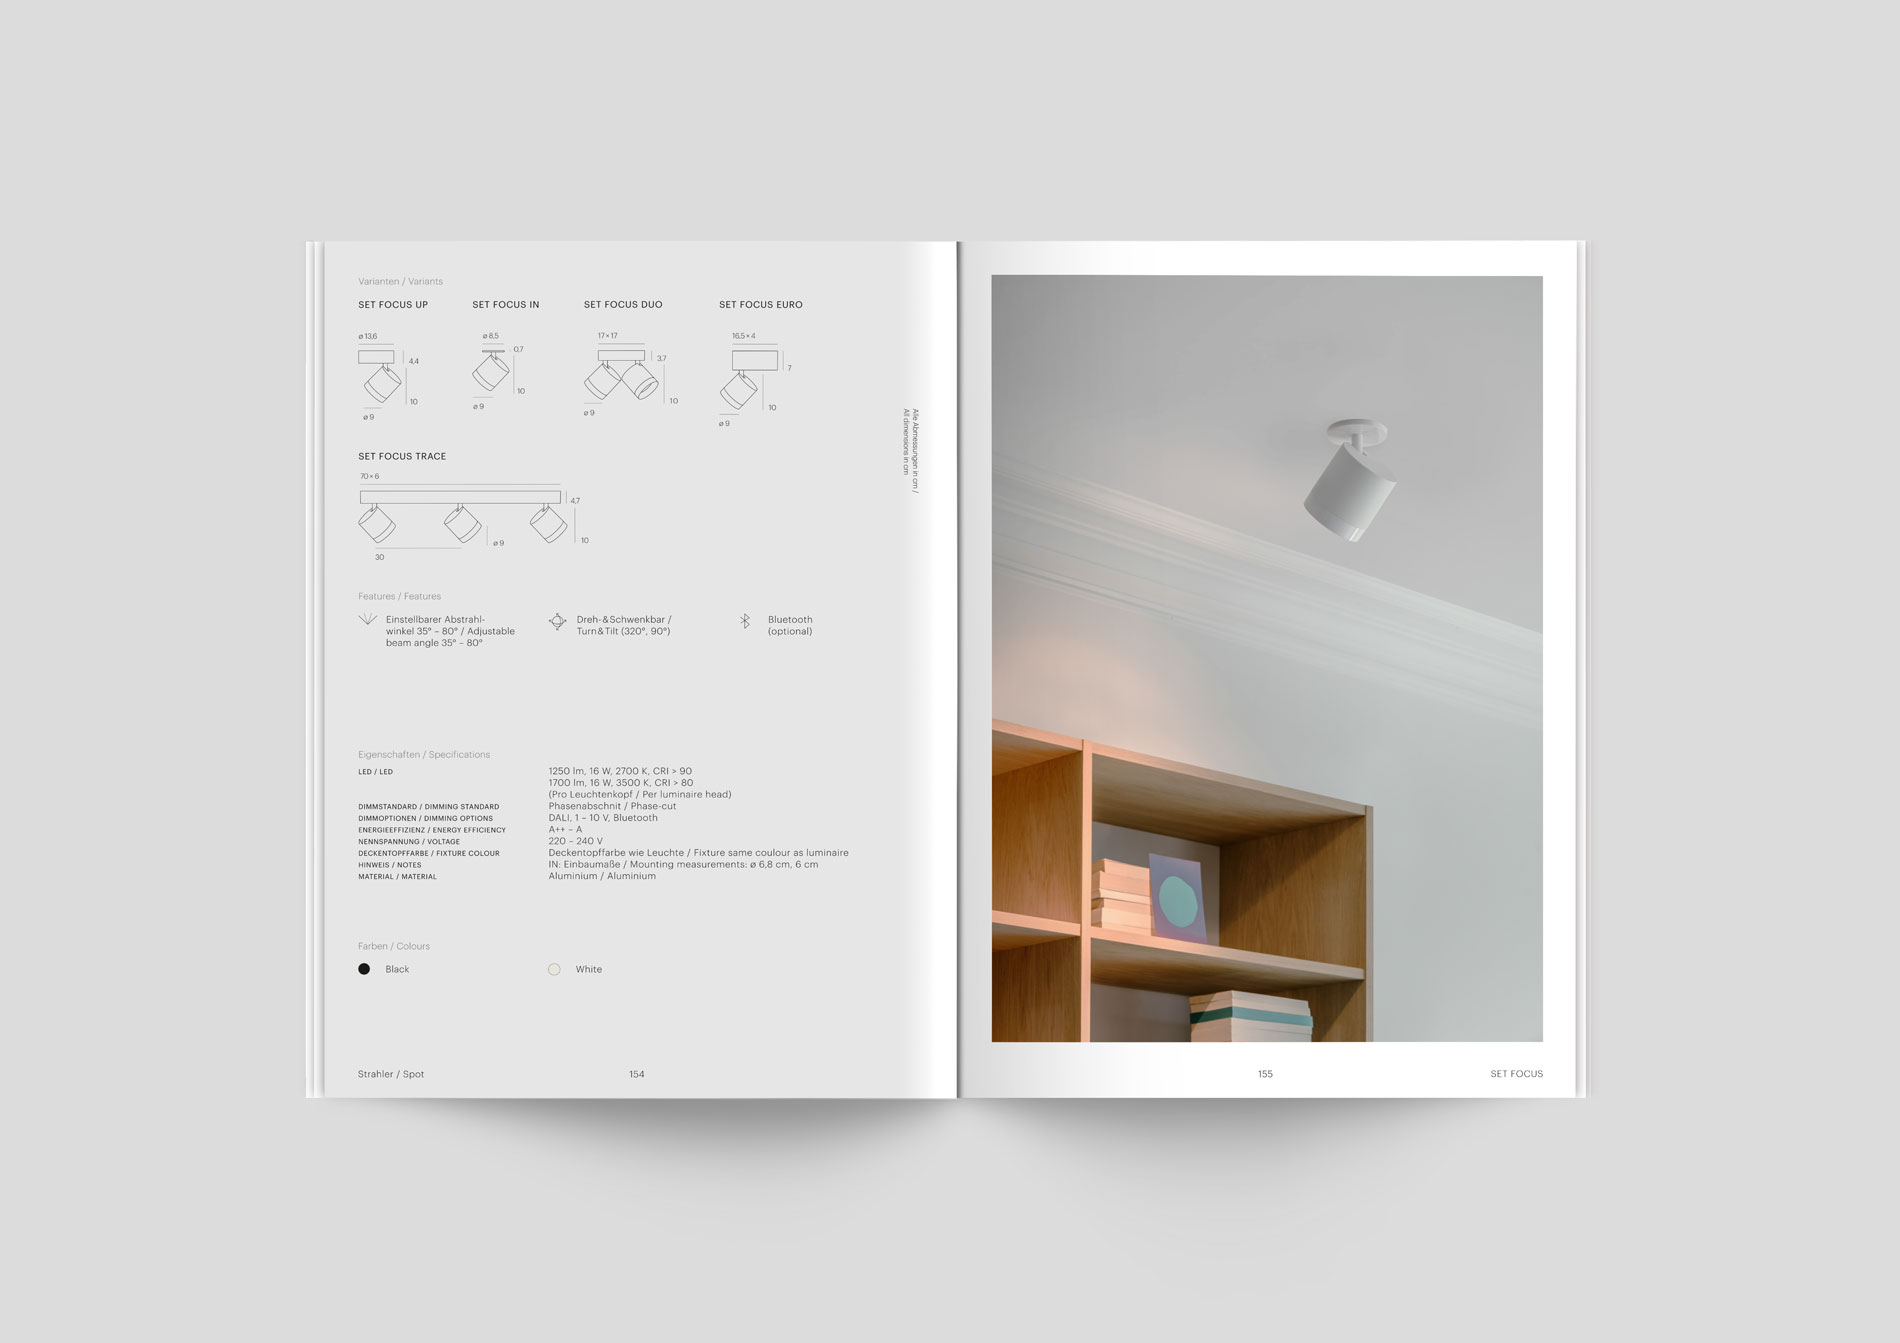 nicoletta-dalfino-tobias-grau-catalogue-2019-18